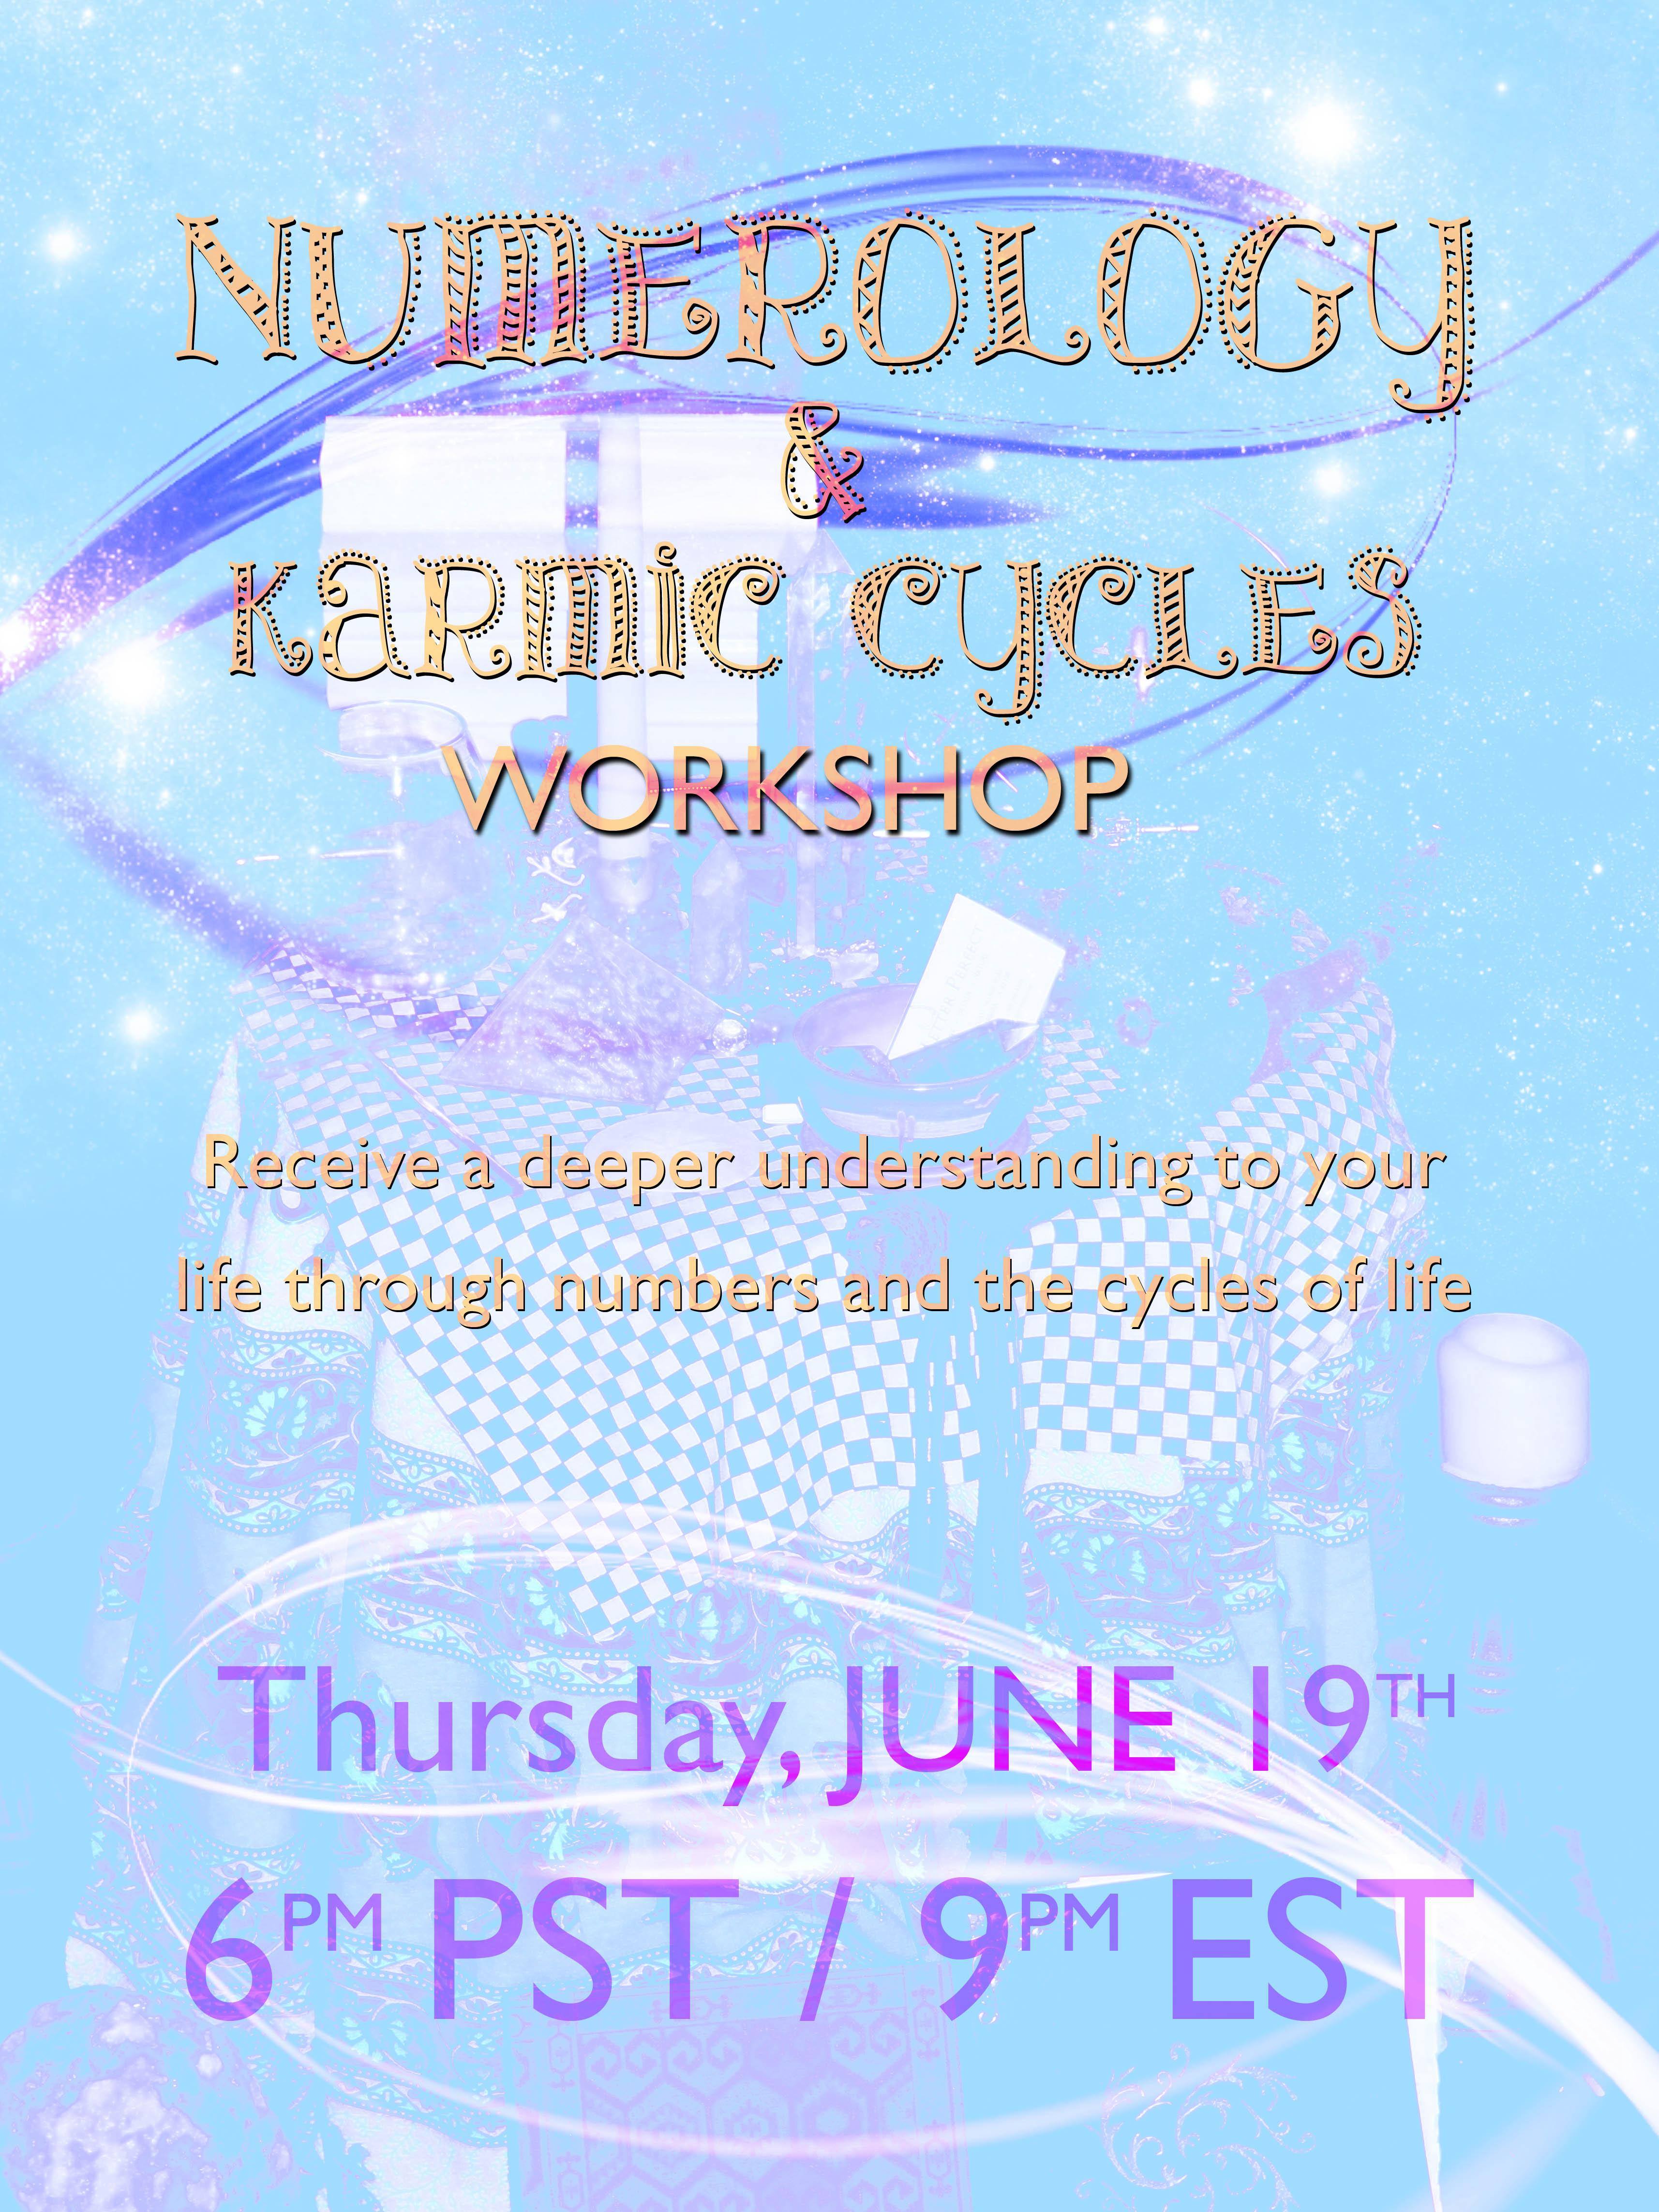 New Workshop!